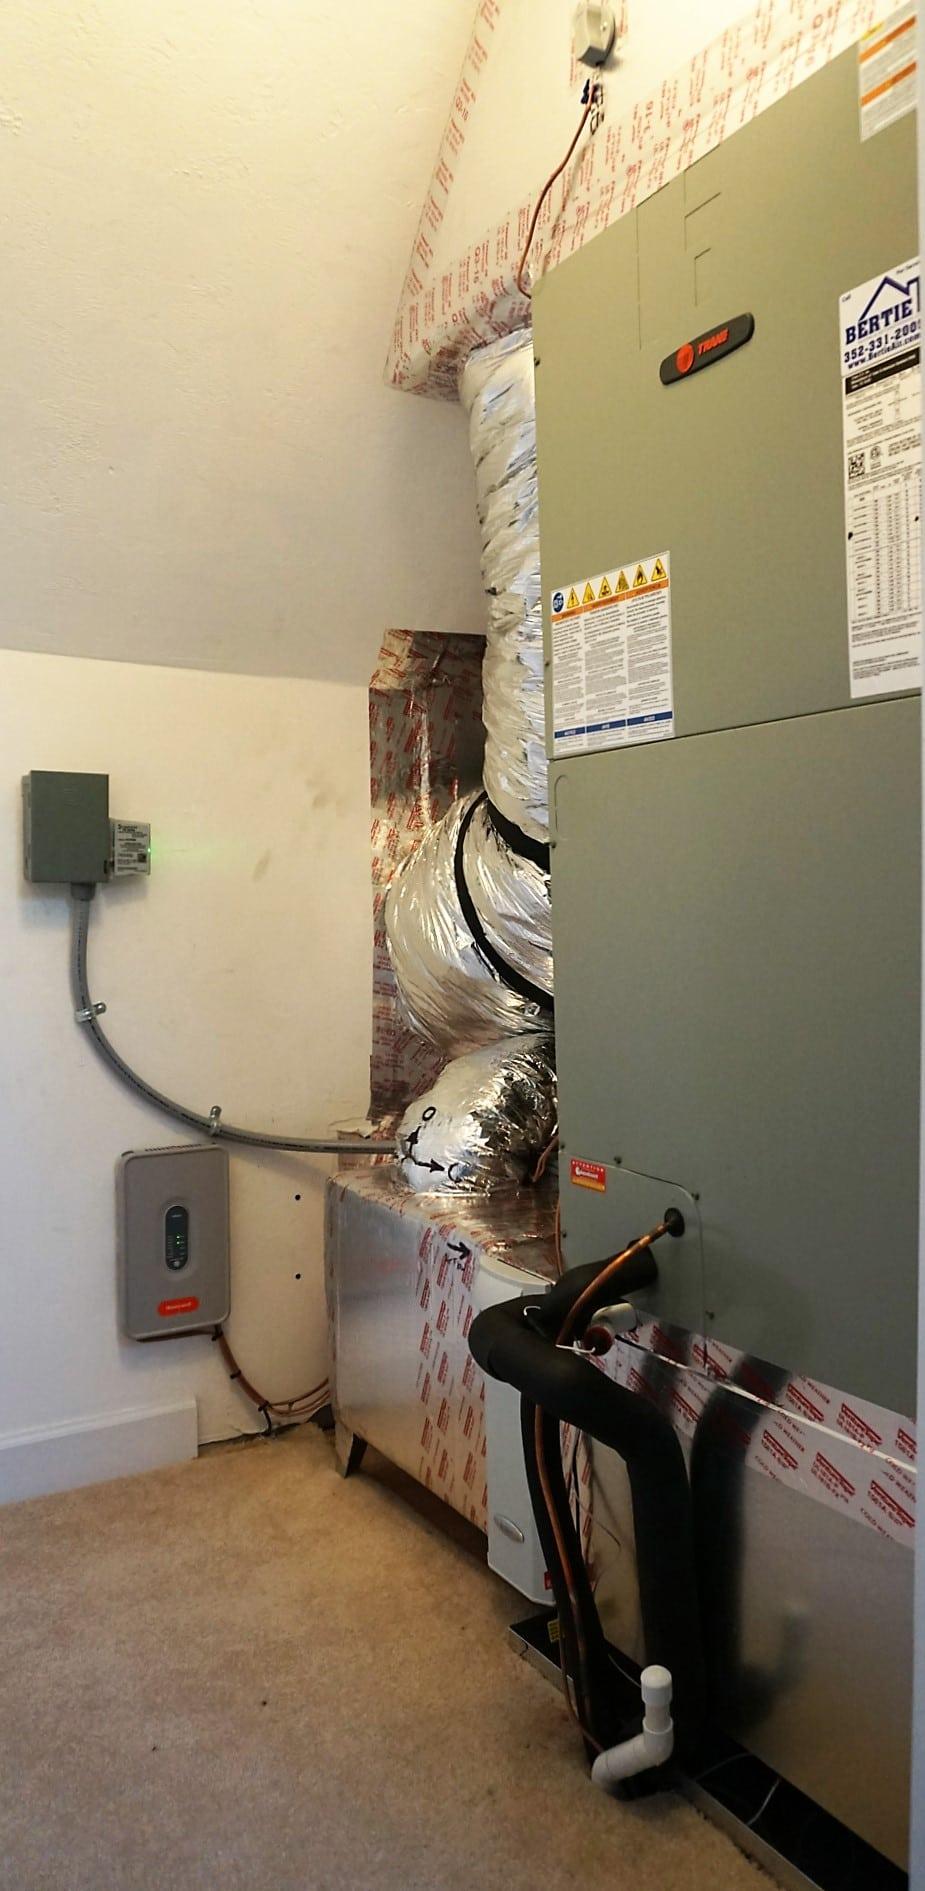 Installation Photos Bertie Heating Amp Air Conditioning Llc